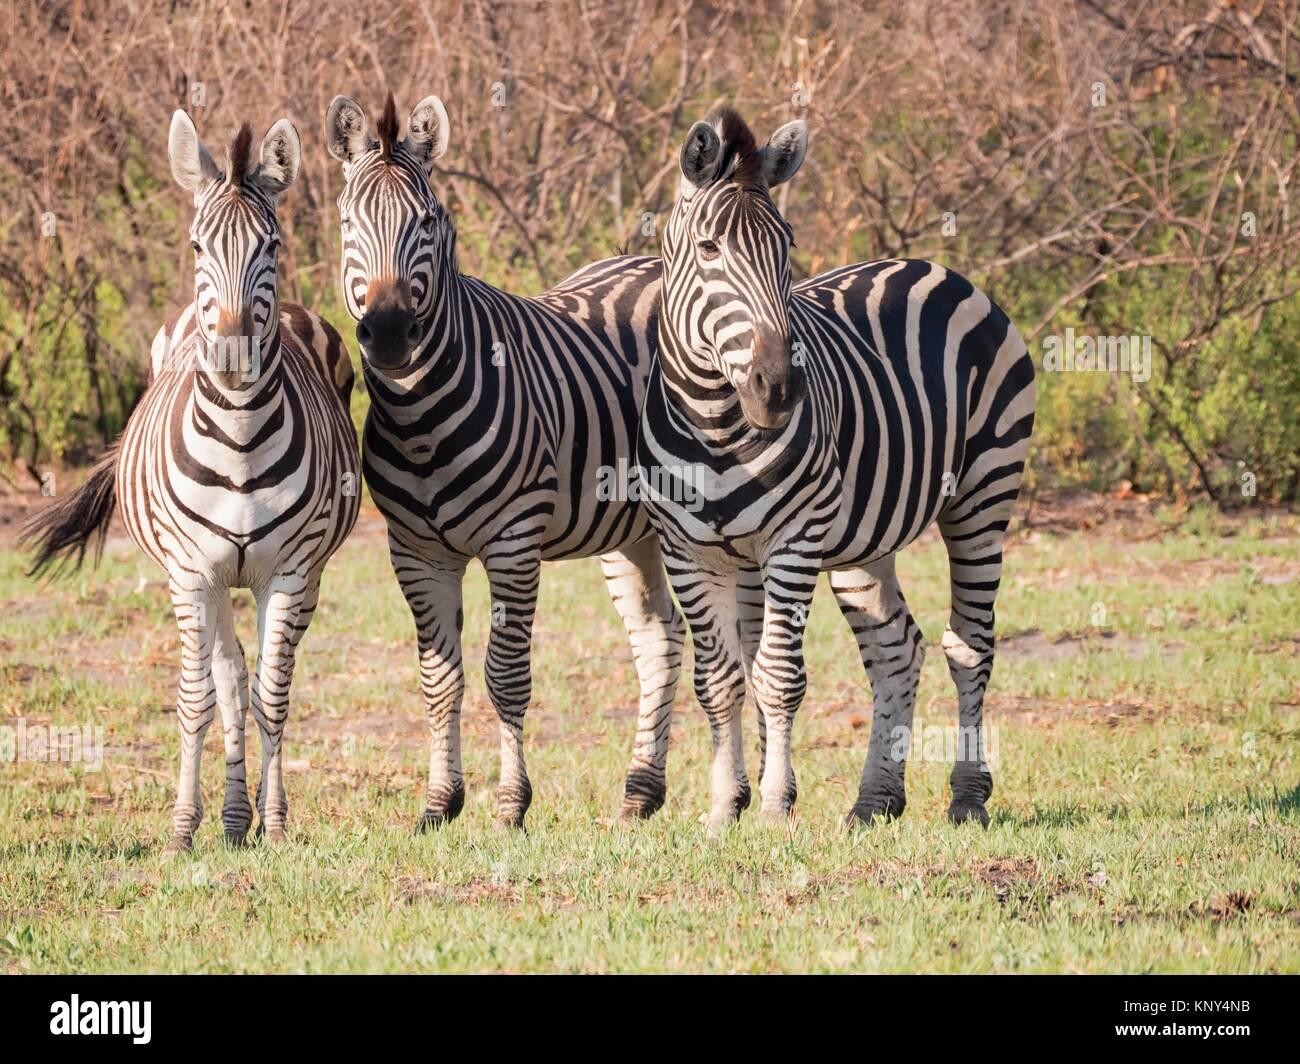 Il Botswana. Zebra. Immagini Stock